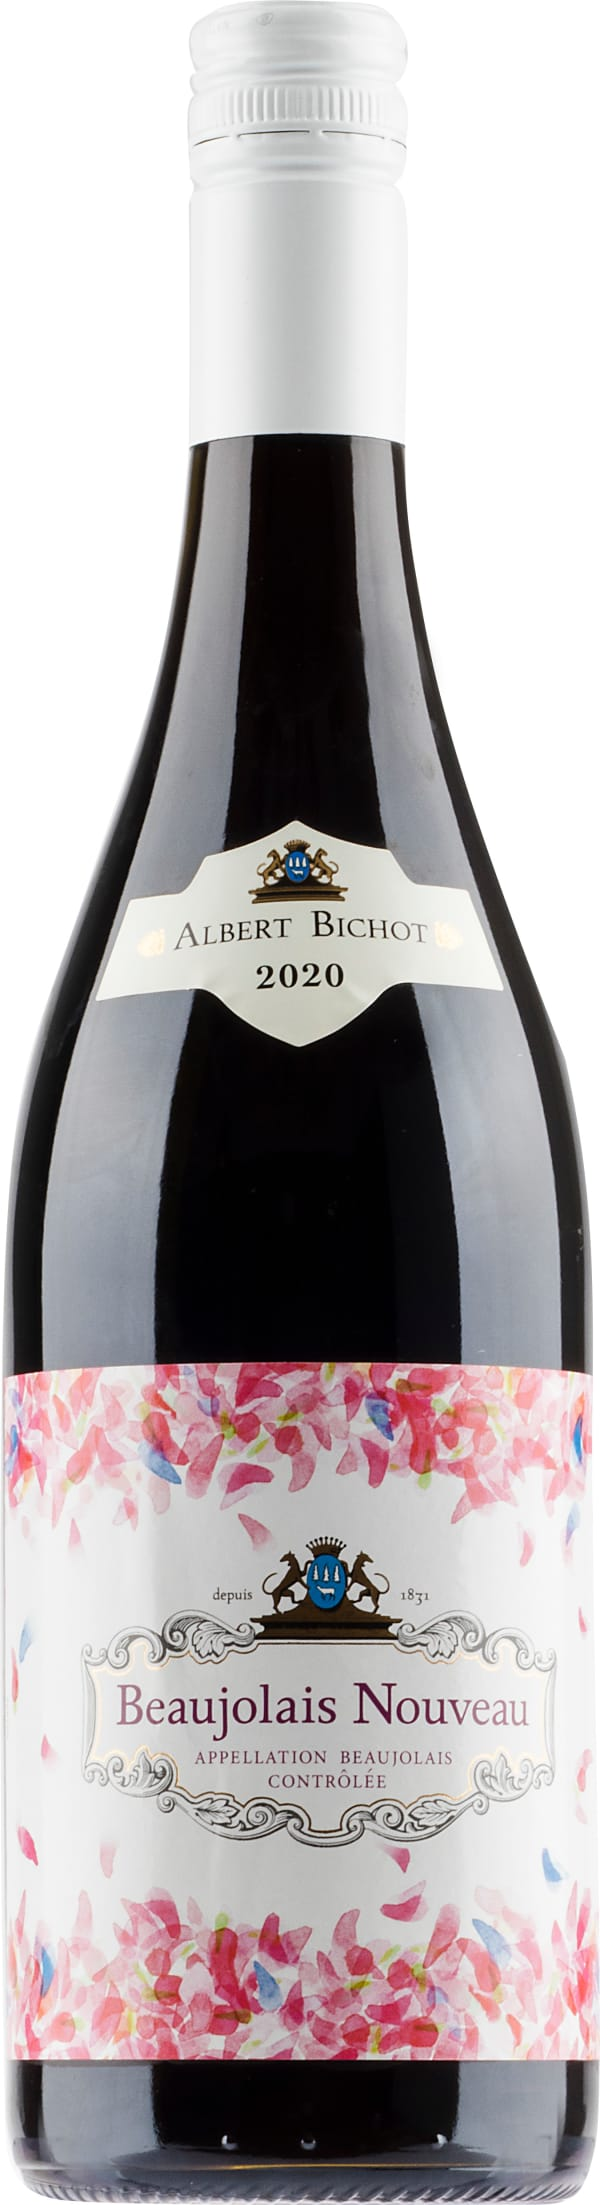 Albert Bichot Beaujolais Nouveau 2020